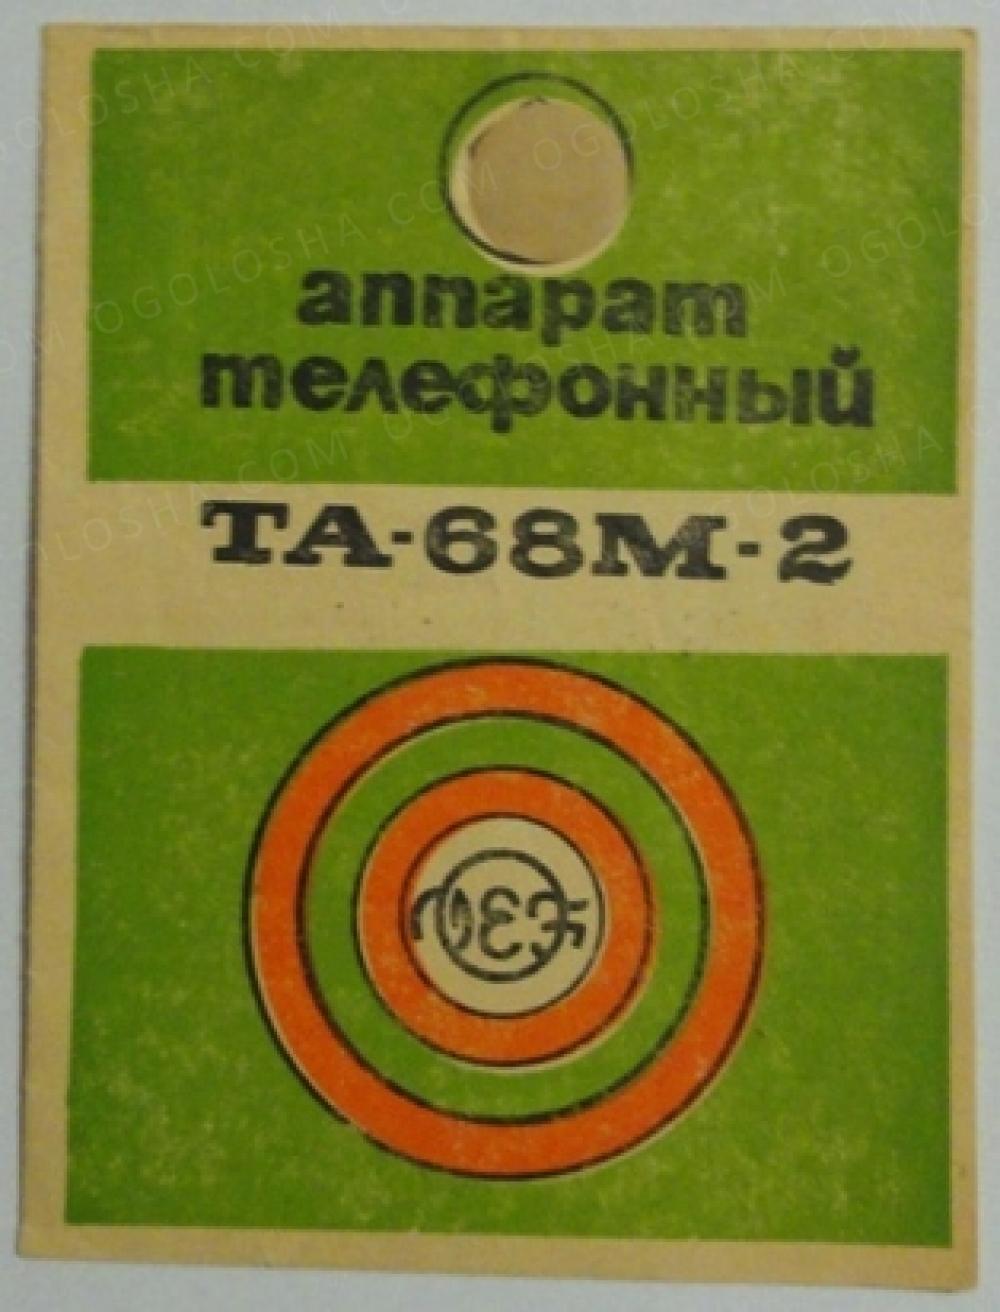 """Аппарат телефонный ТА-68М-2. Паспорт"" (VEF.1986)"